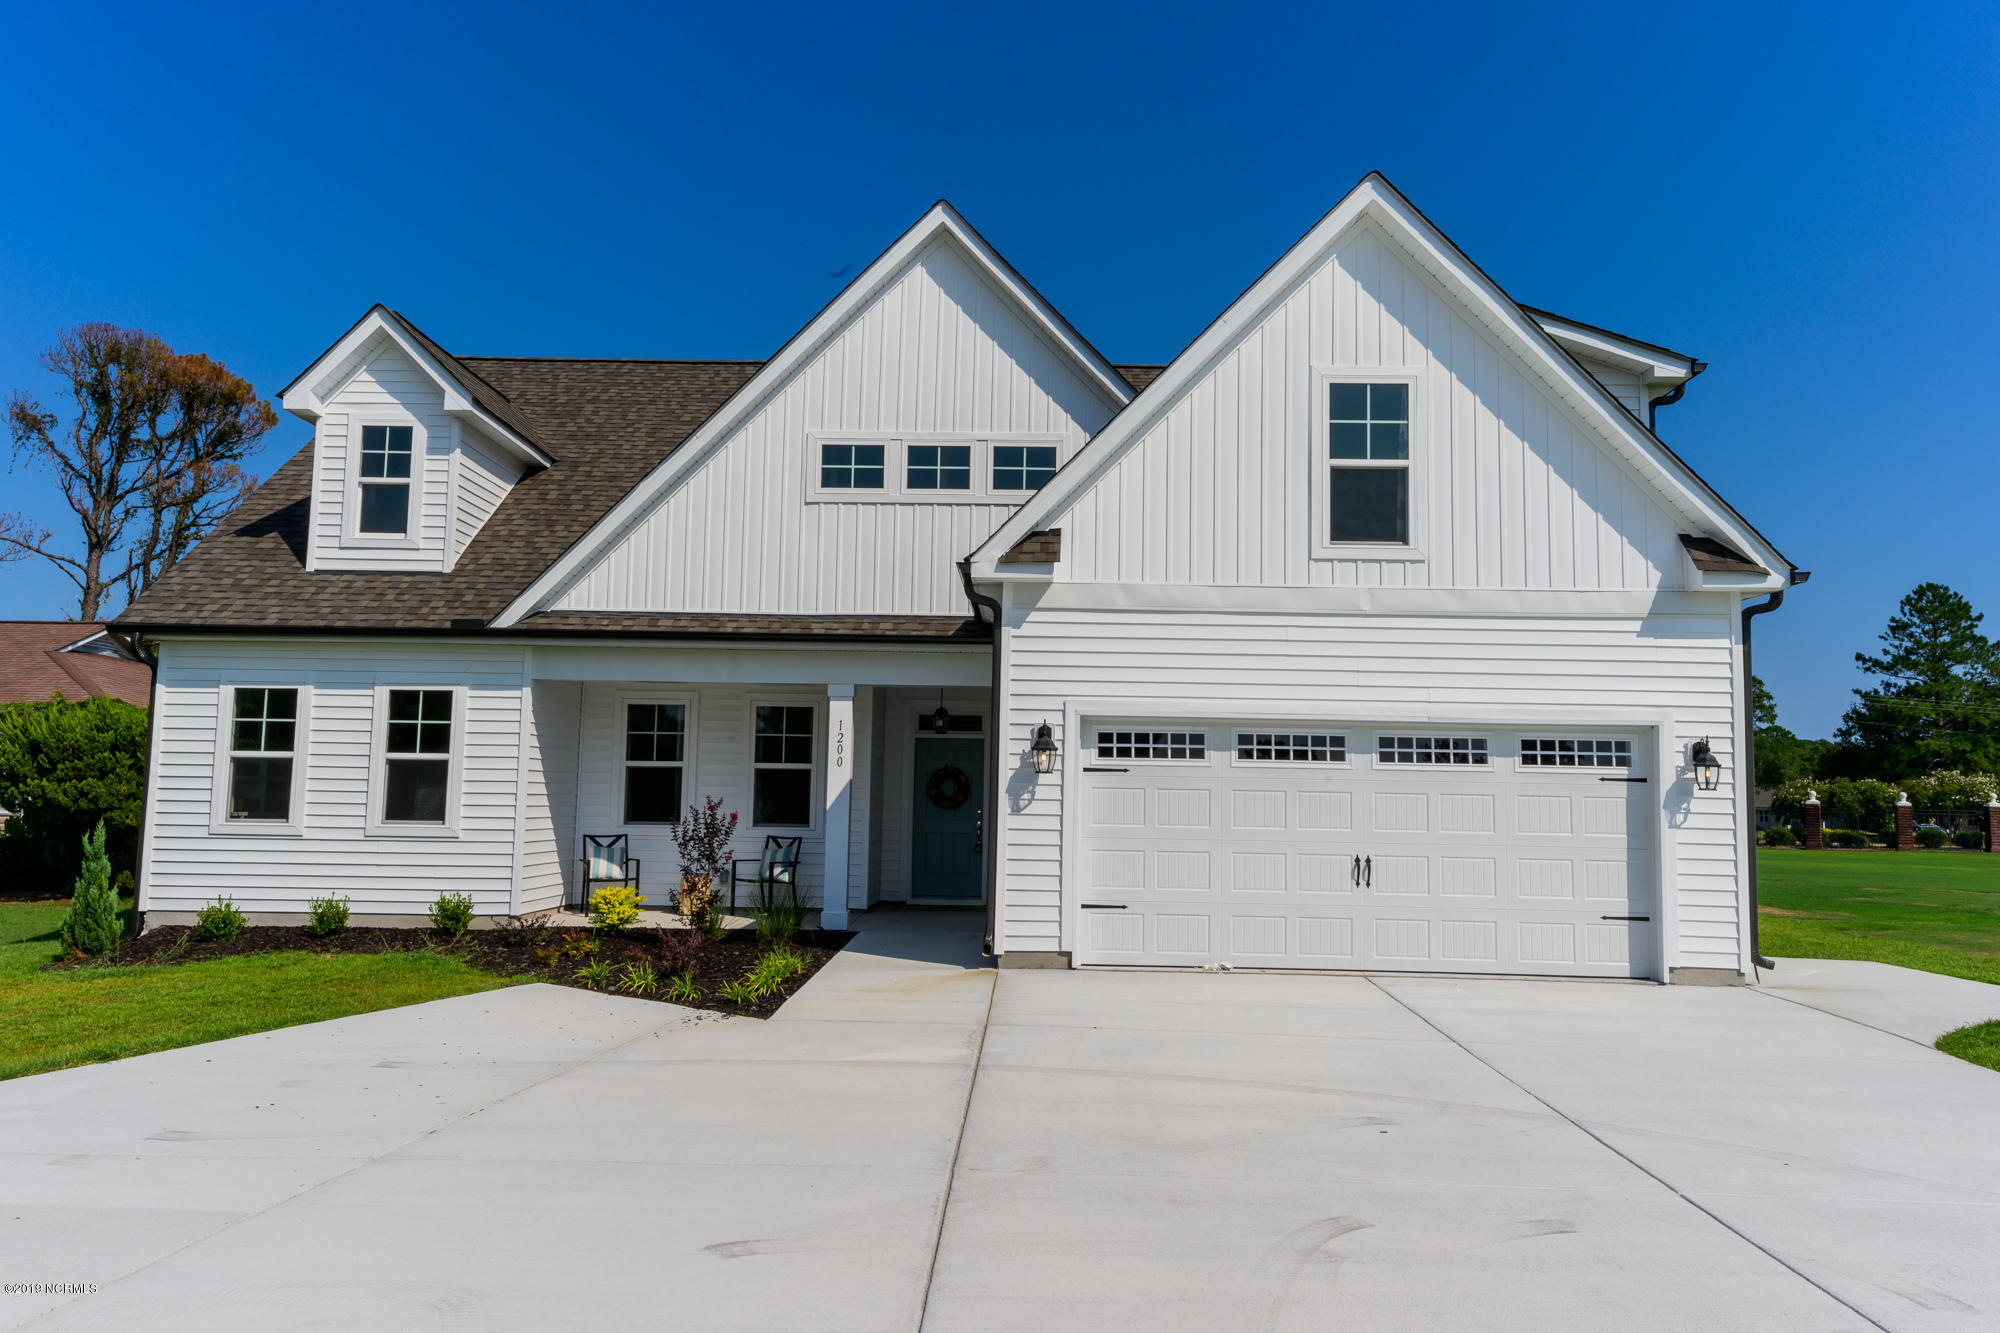 1200 Caracara Drive, New Bern, North Carolina 28560, 3 Bedrooms Bedrooms, 7 Rooms Rooms,2 BathroomsBathrooms,Single family residence,For sale,Caracara,100180255